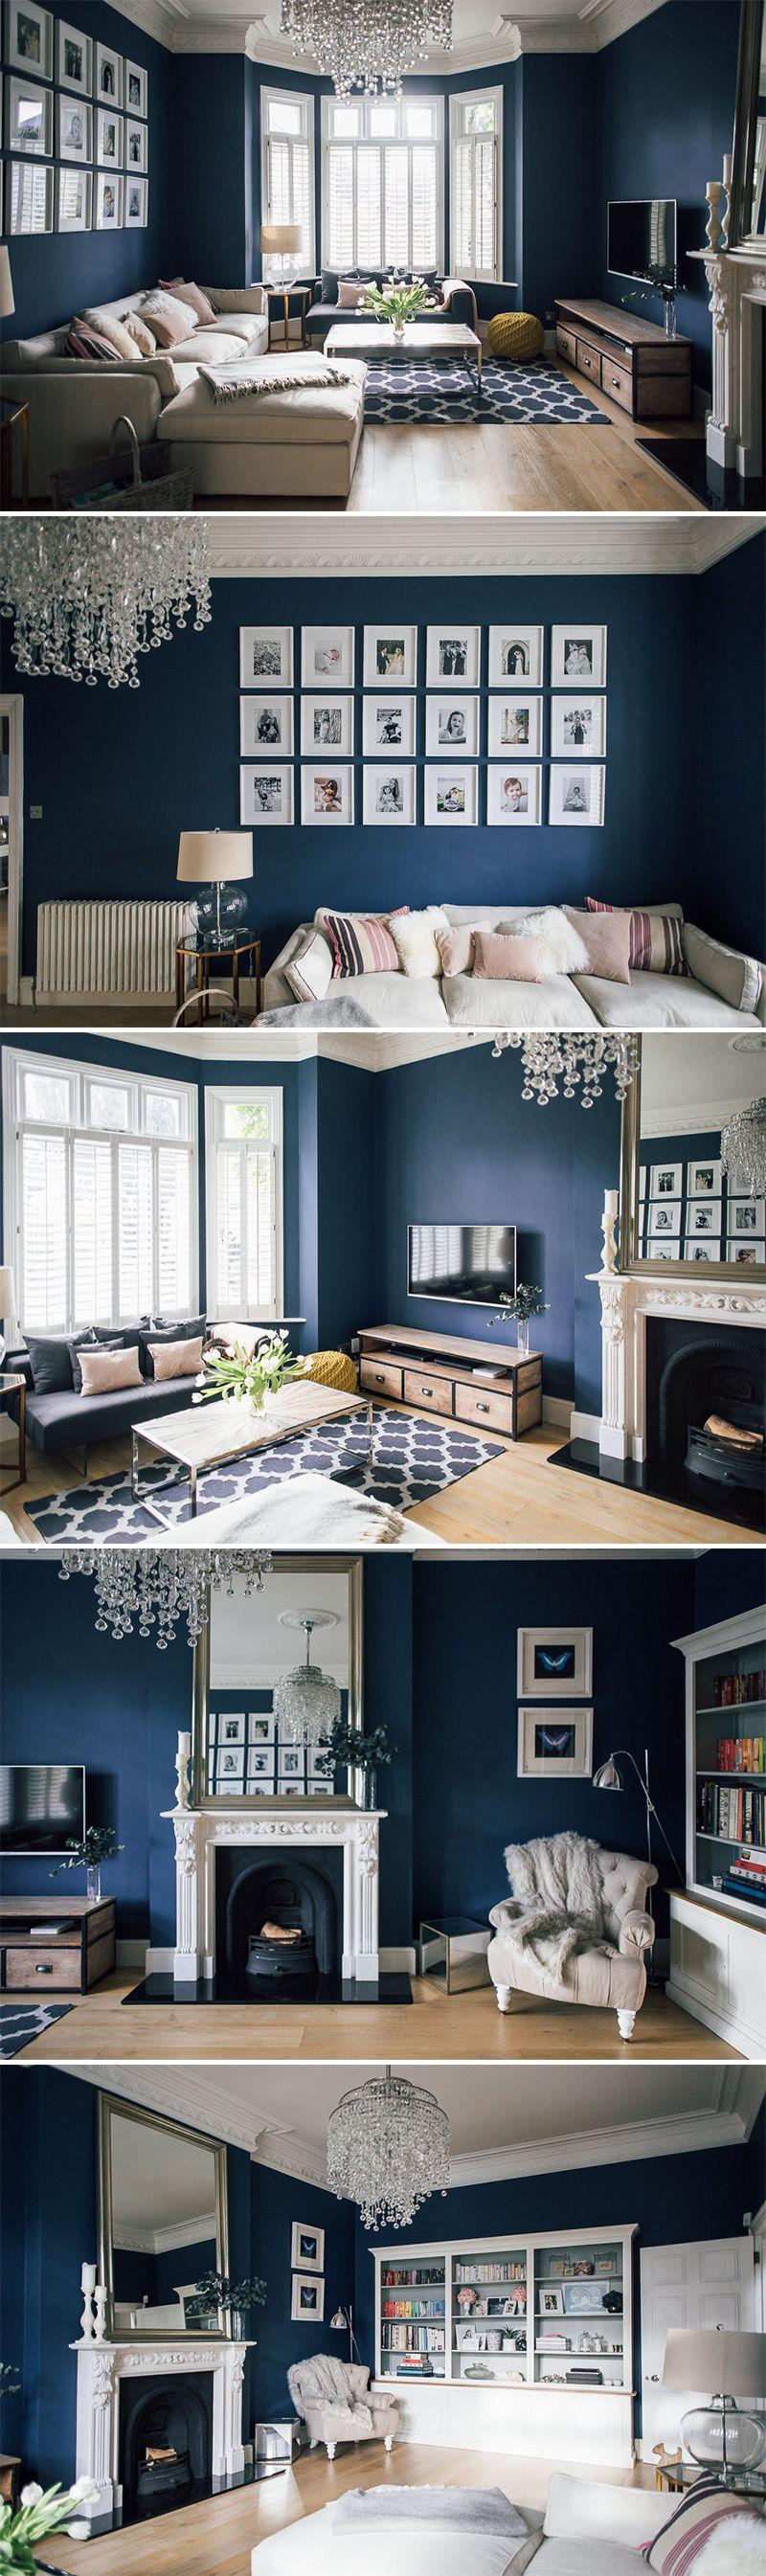 Leomau0027s Awe Inspiring London Home. Sitting Room ...